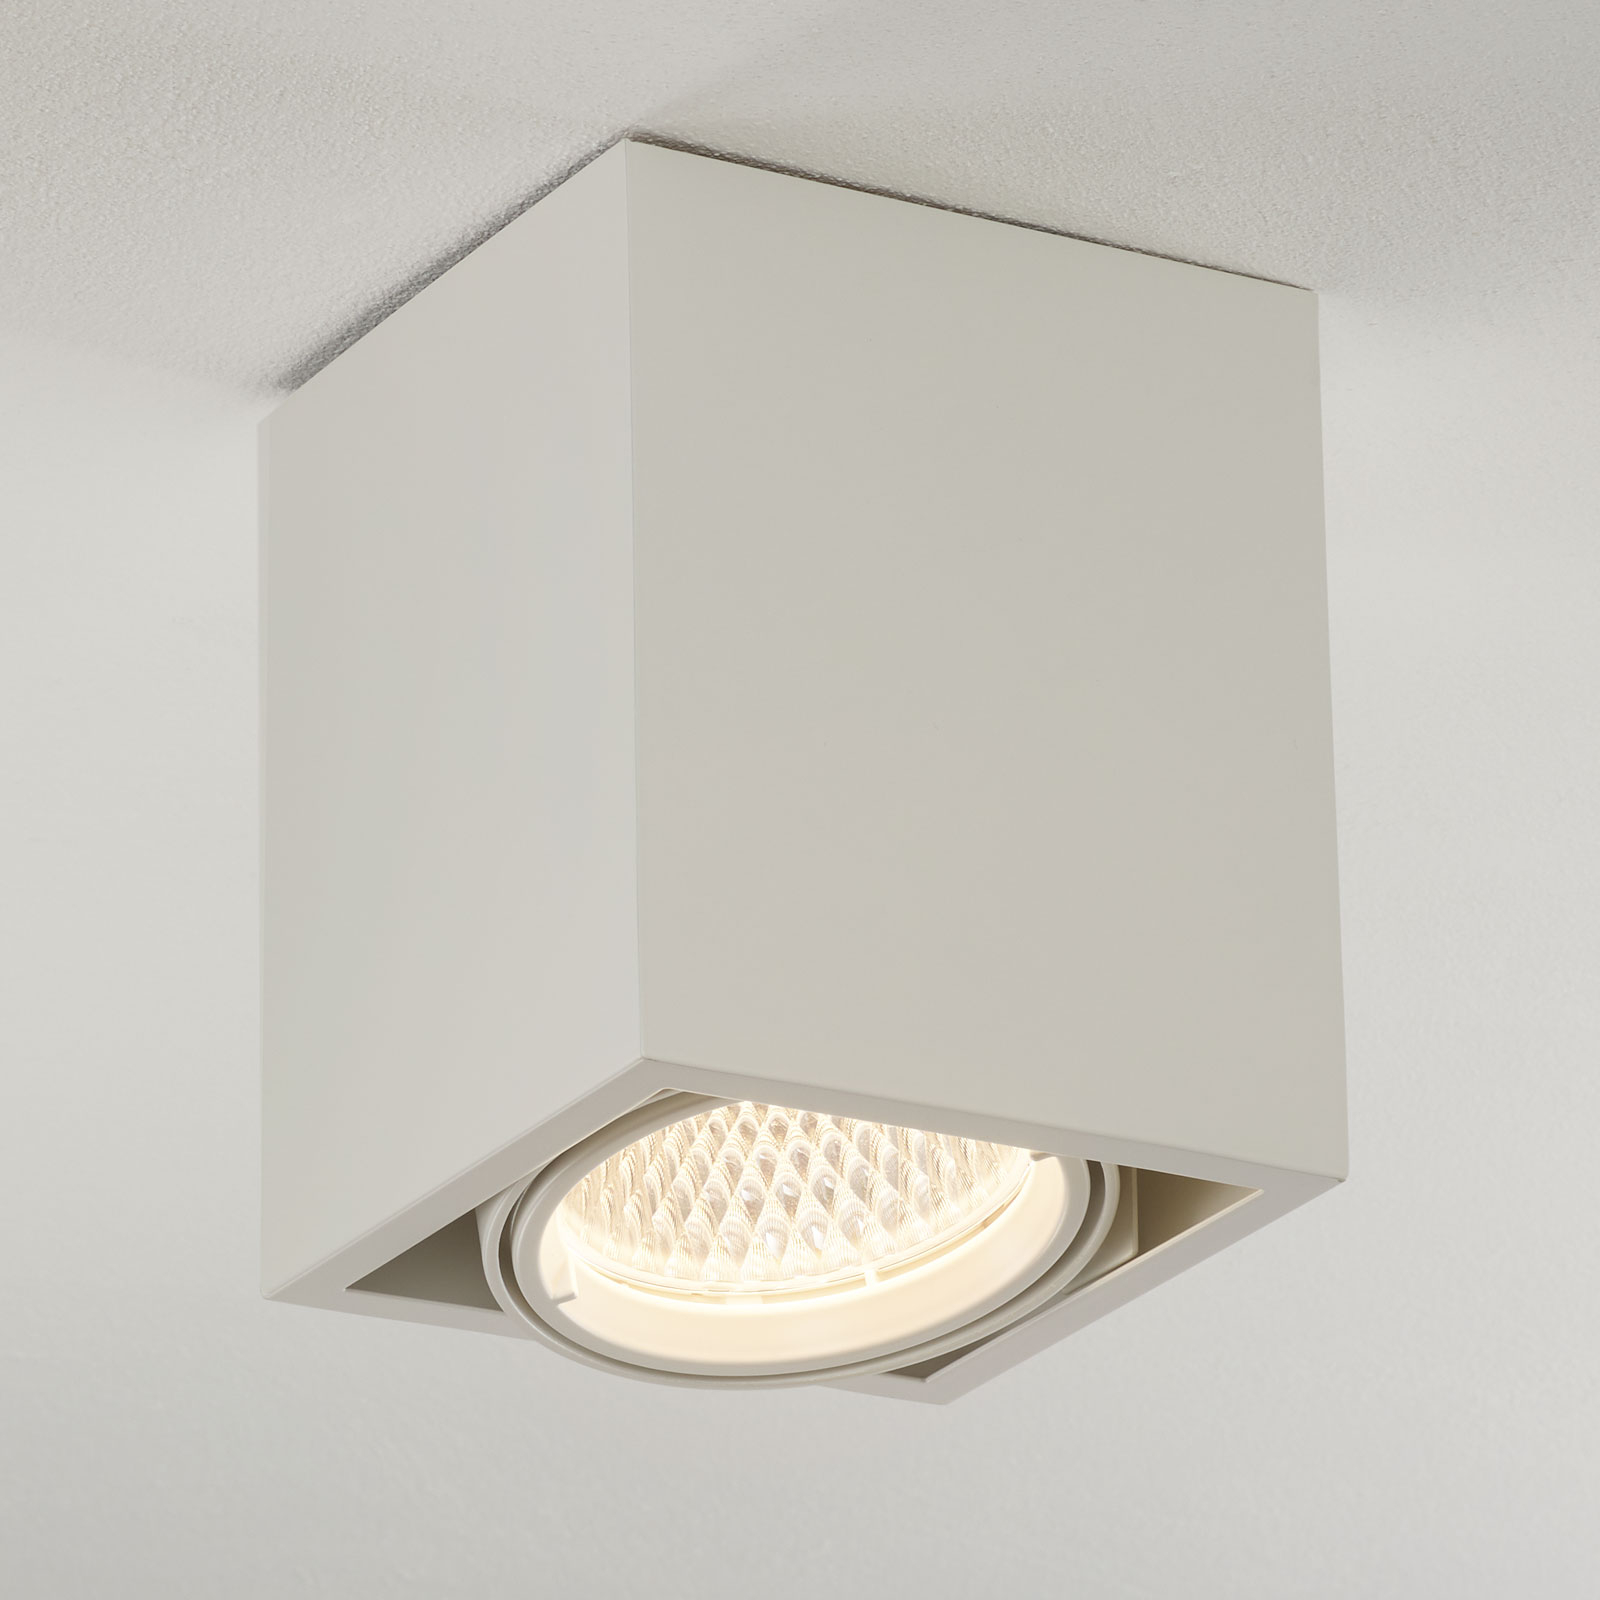 Arcchio Cirdan lampa sufitowa LED 1-punktowa biała